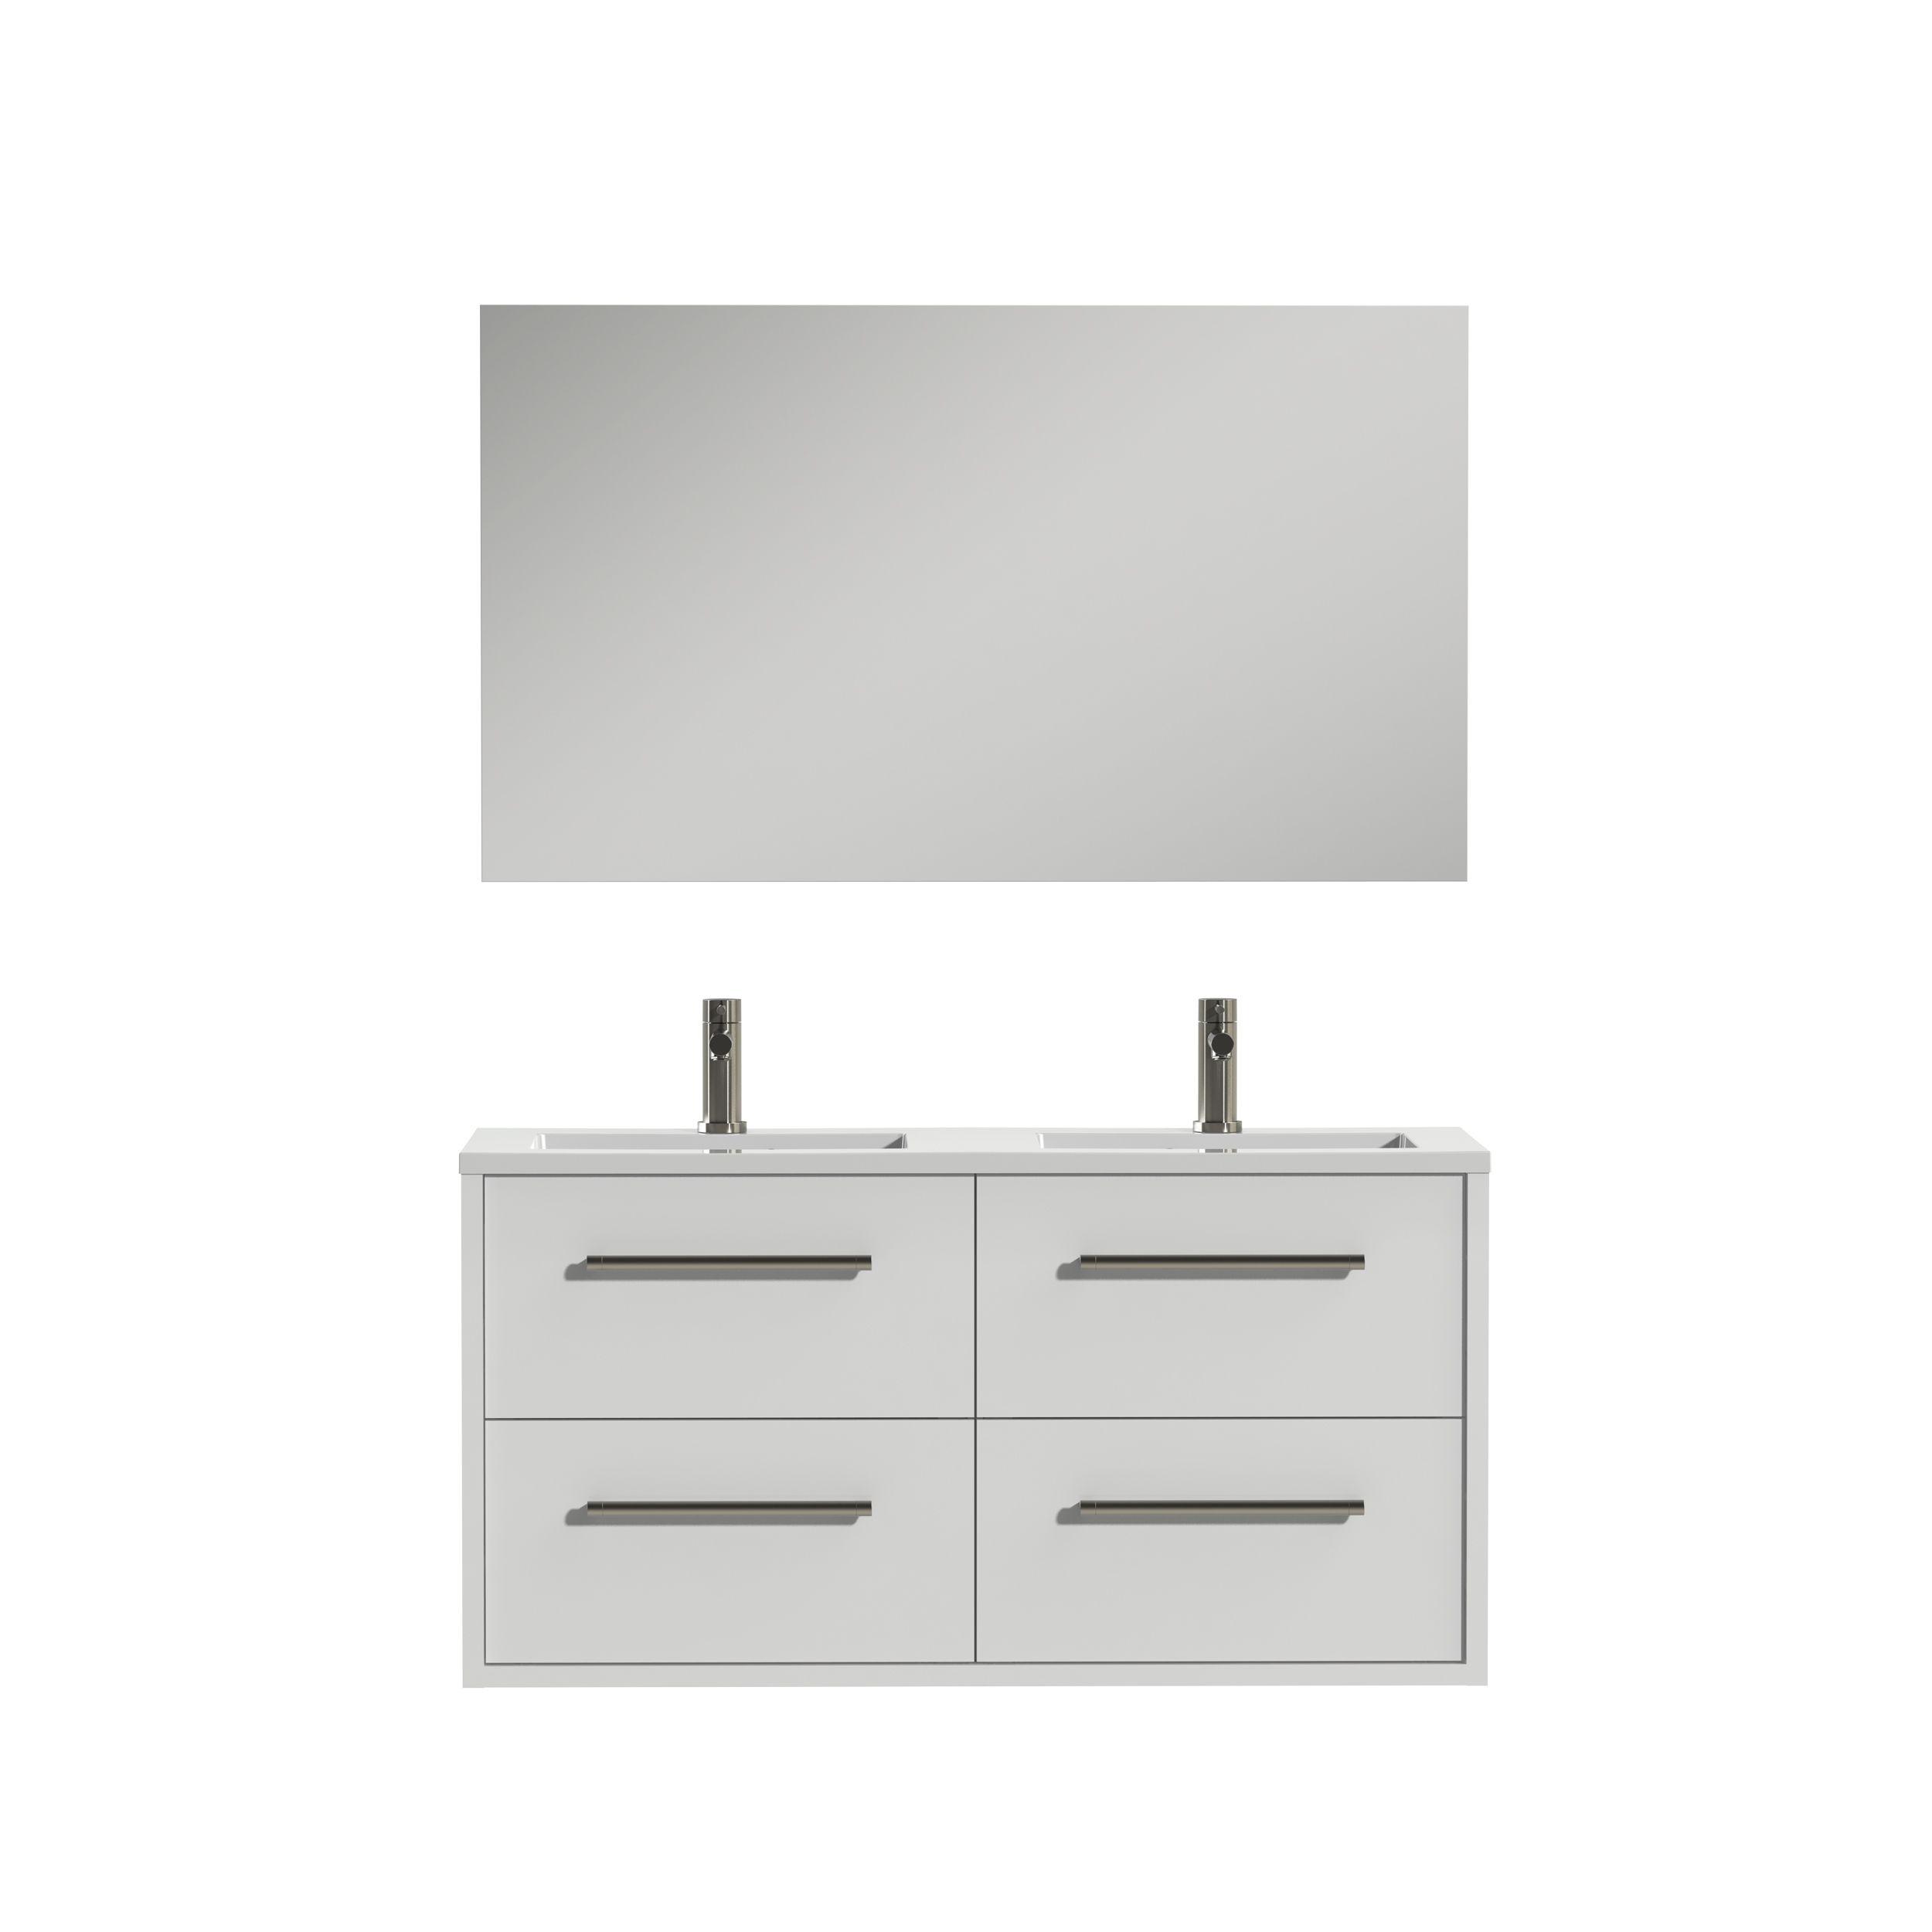 Tiger Boston badmeubelset incl spiegel en witte wastafel 120cm wit